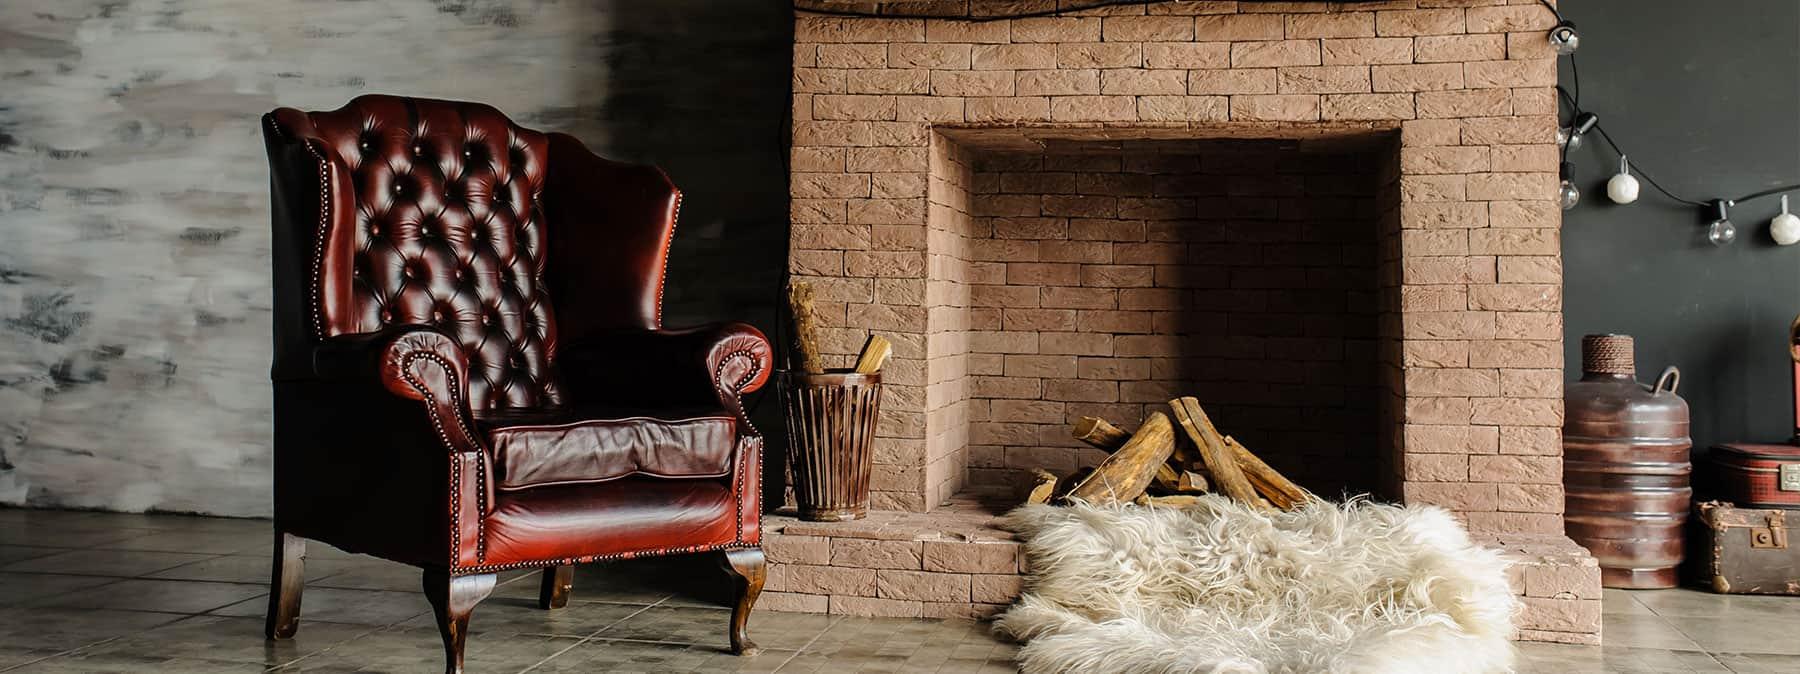 certificat de ramonage ramosud. Black Bedroom Furniture Sets. Home Design Ideas